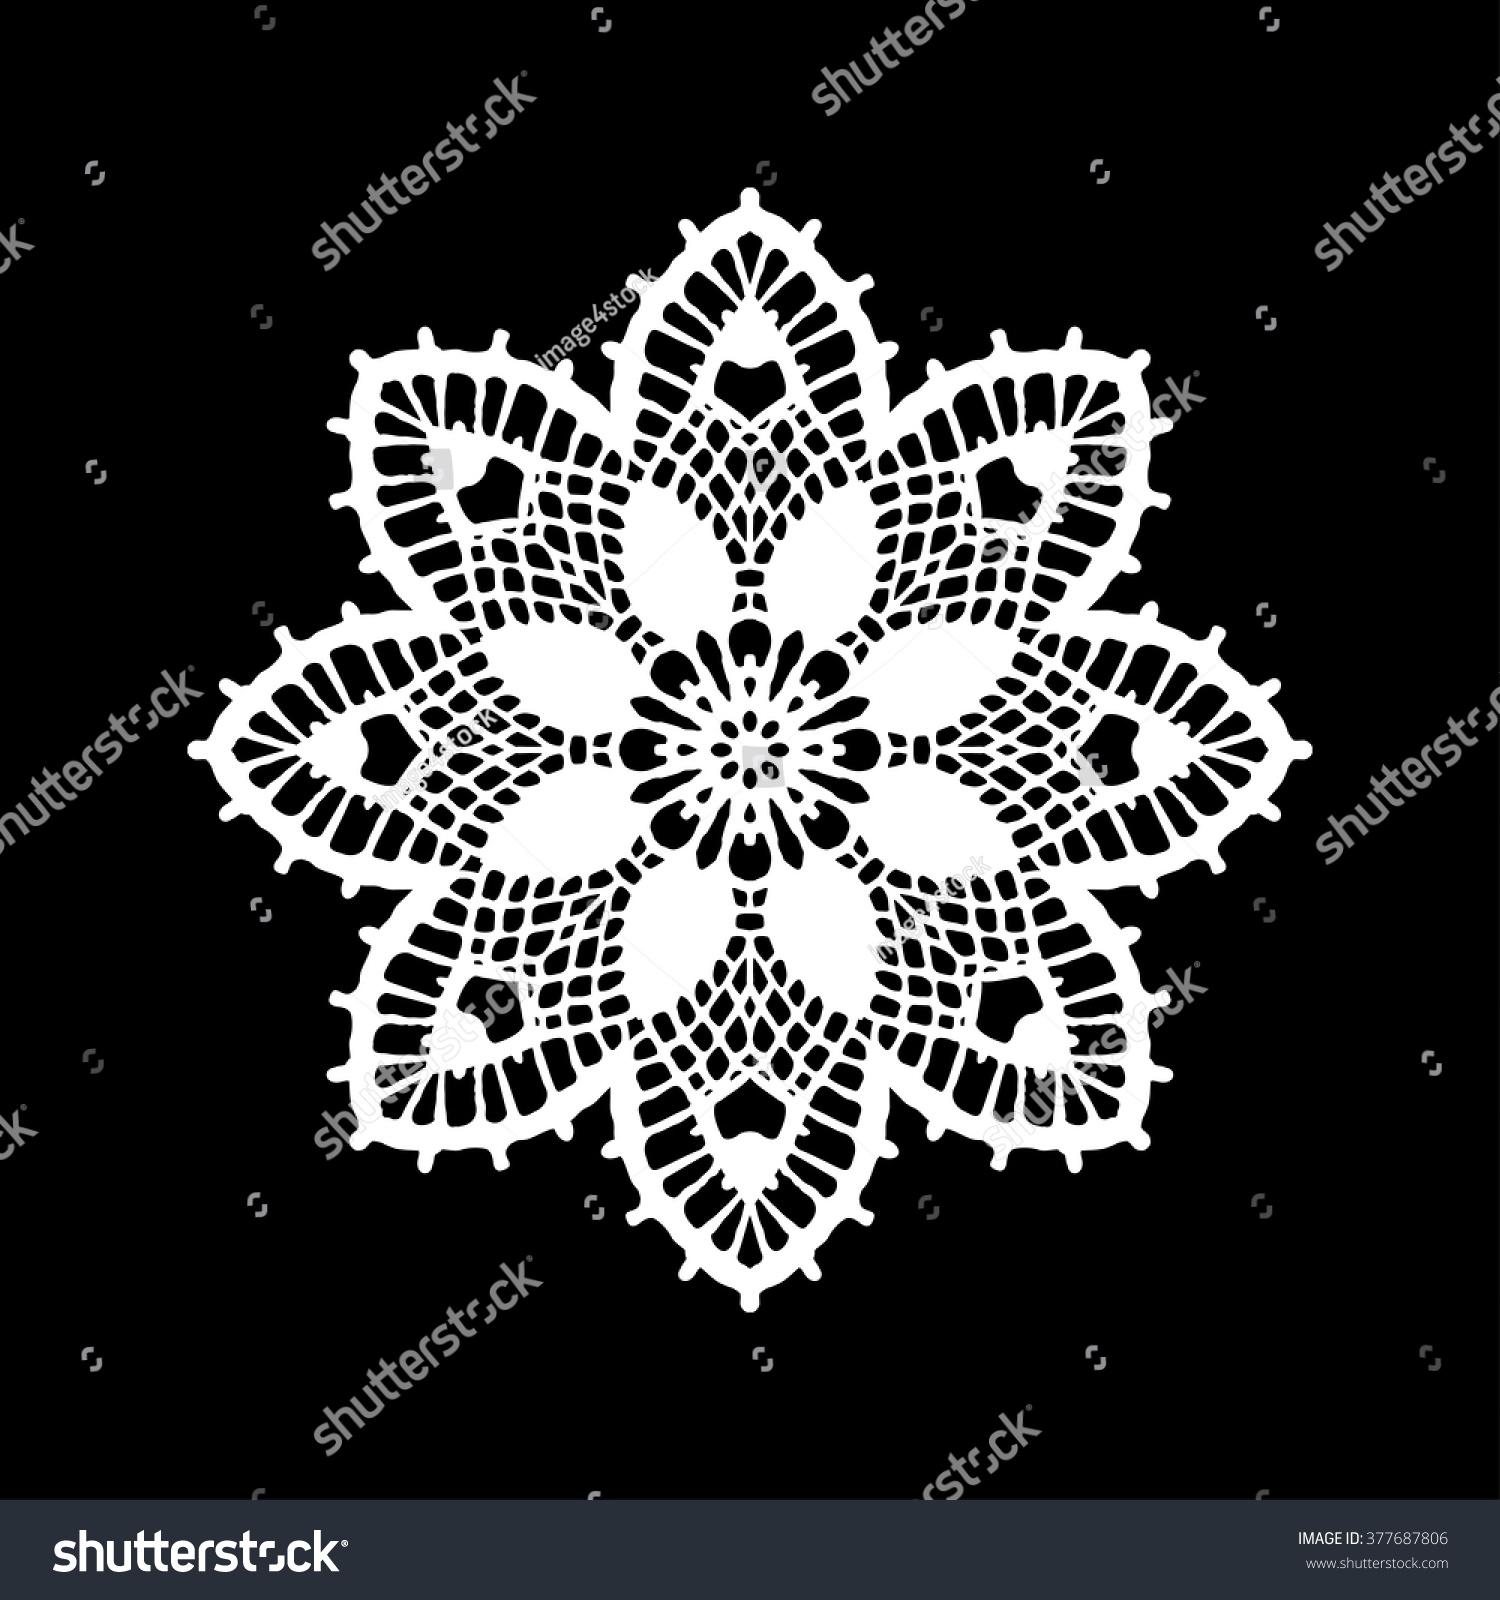 Lace Doily Hand Made Cutout Wedding Decor Design Element